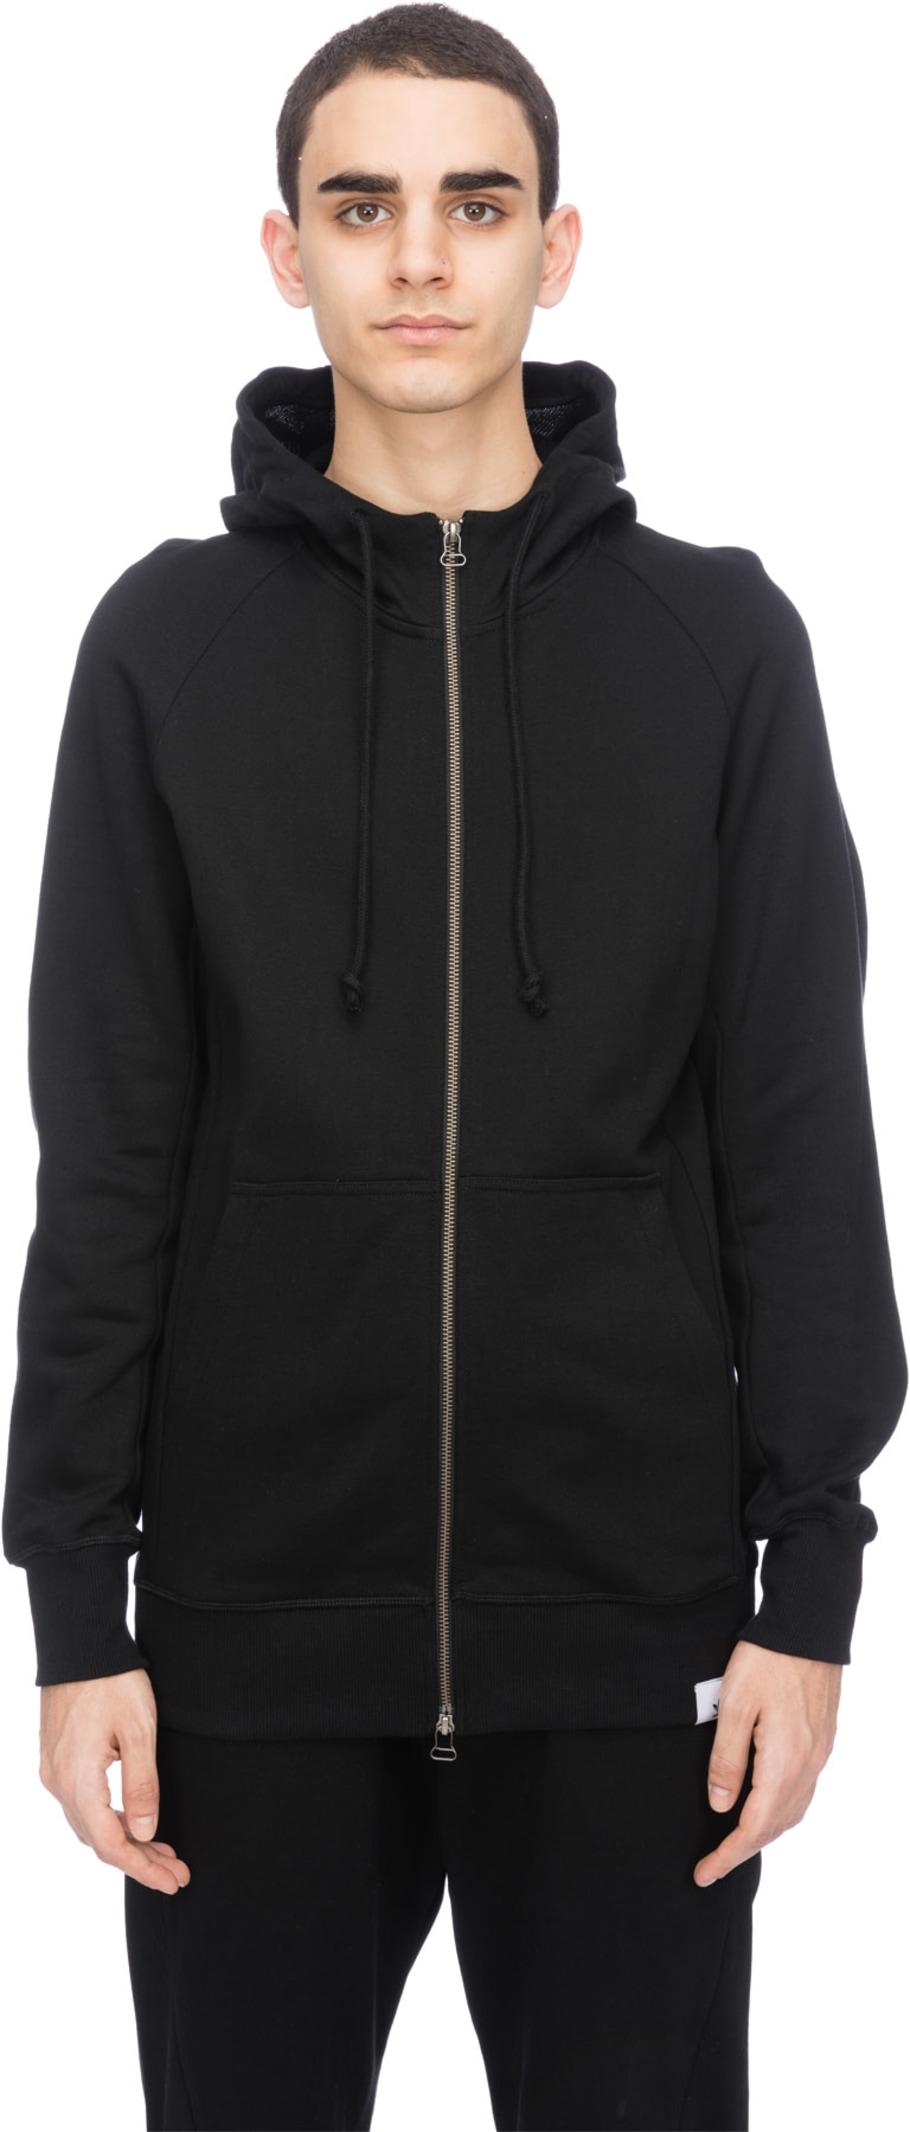 adidas Originals XBYO Zip Hoodie Black